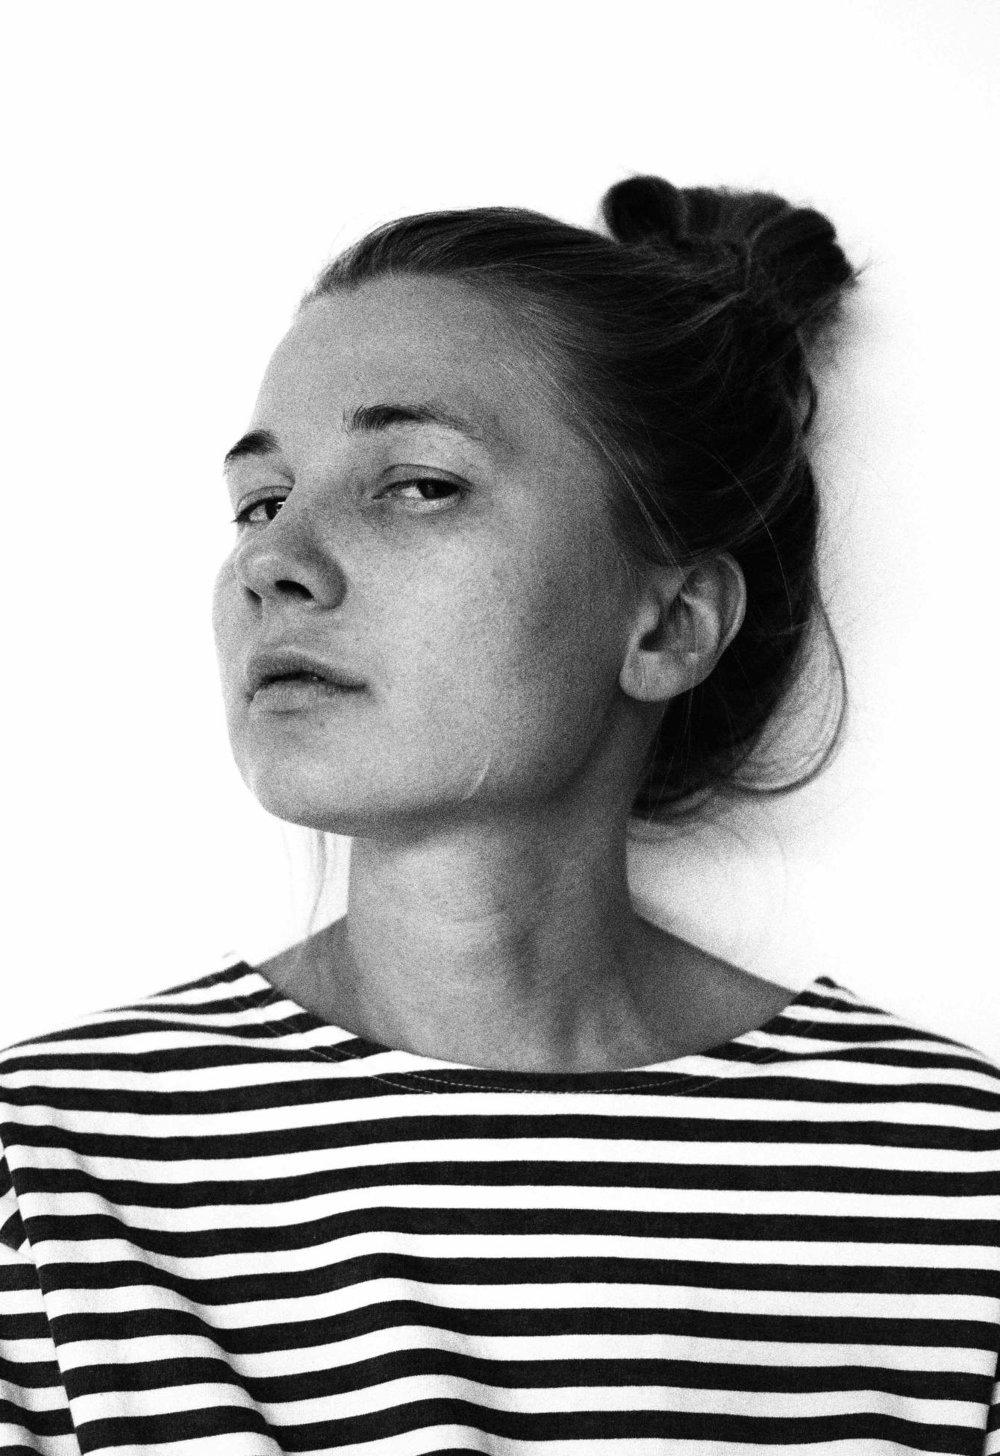 Julia-Portrait-Lowres_1340_c.jpg